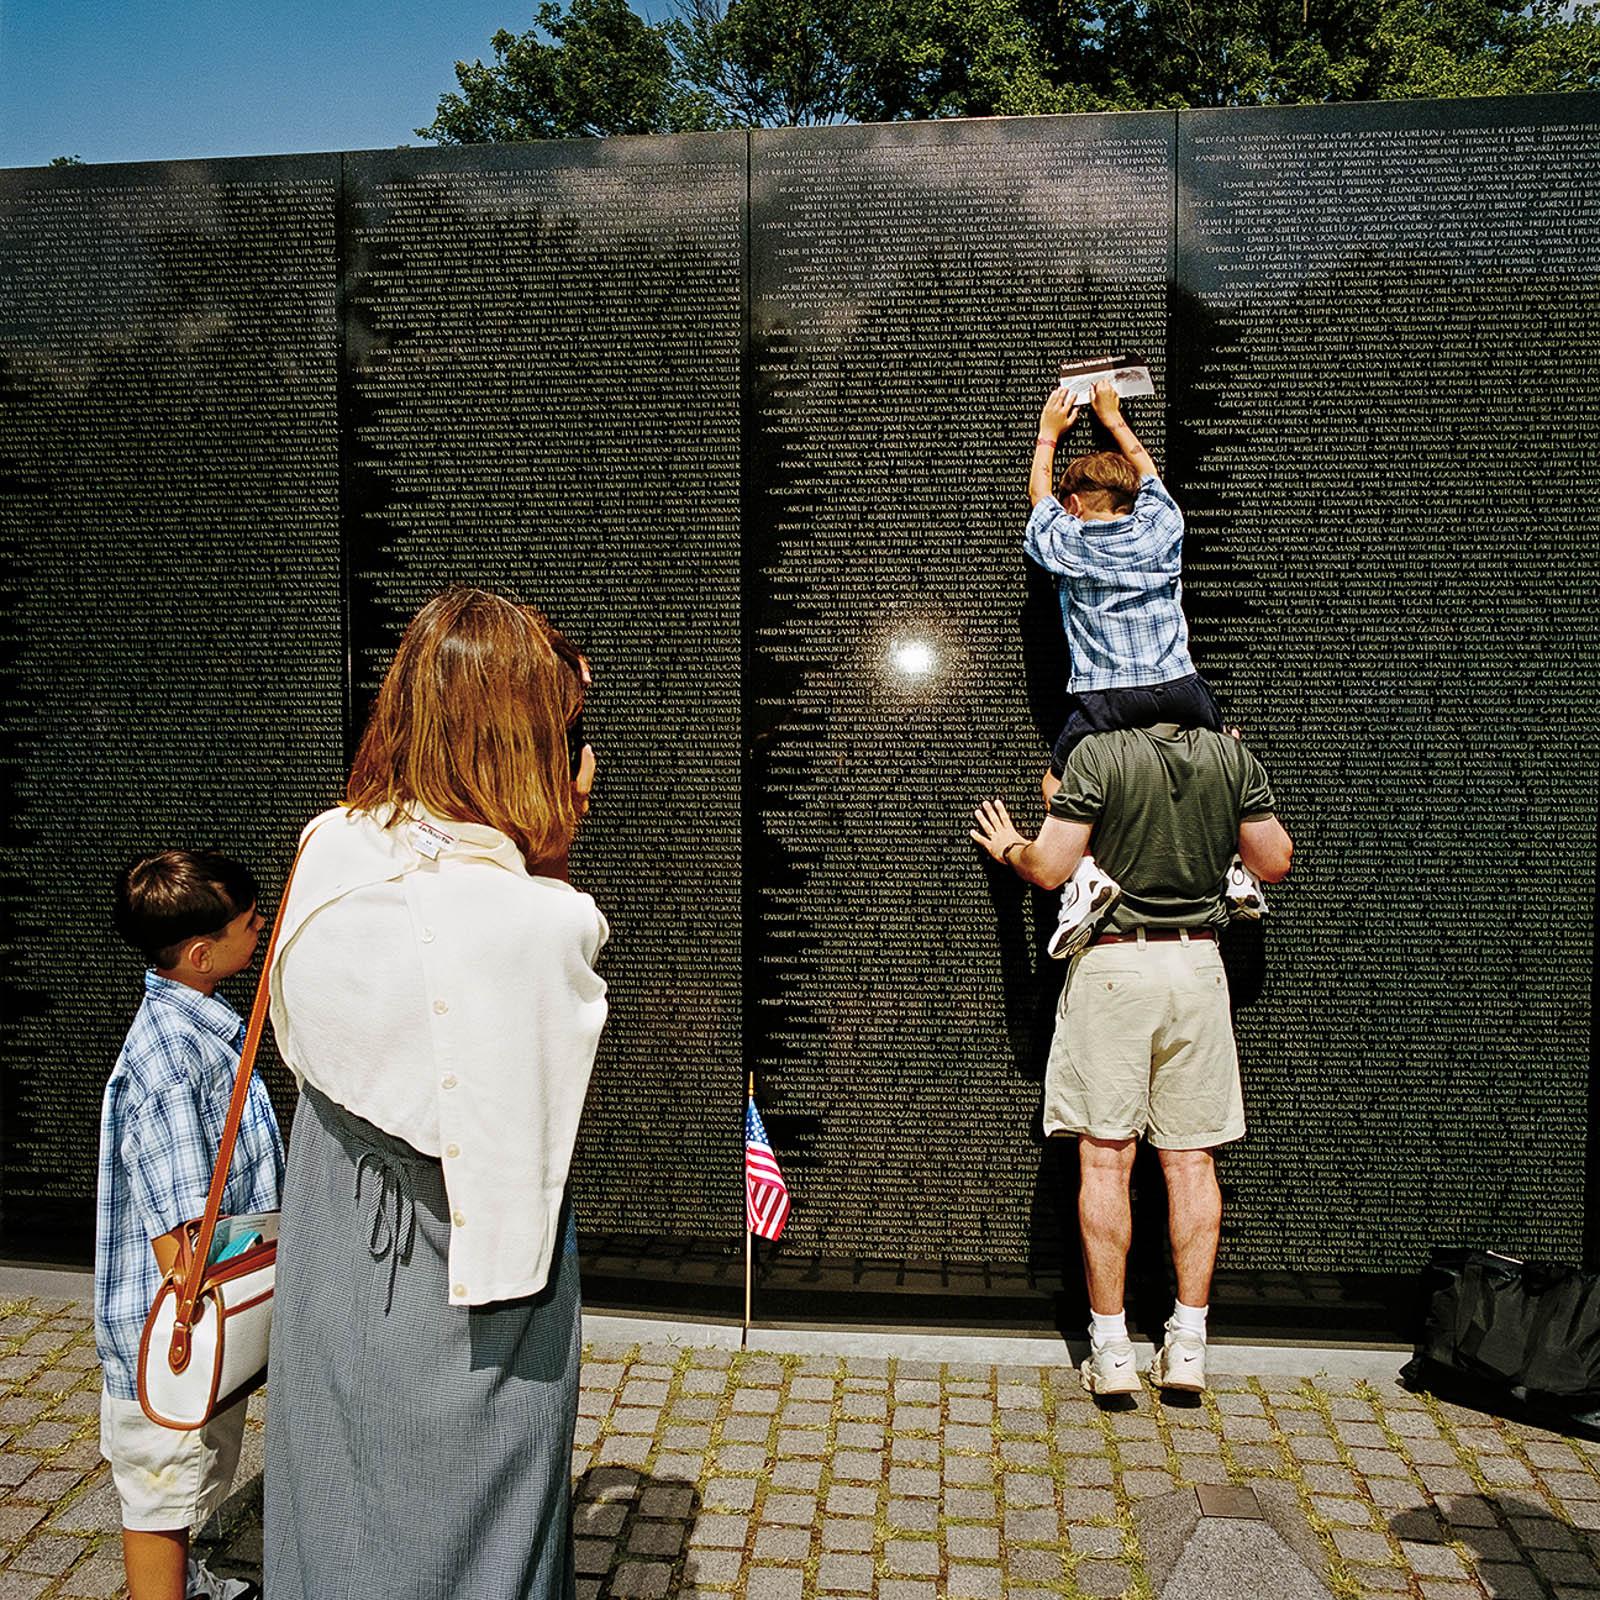 Family Taking Rubbing at Vietnam Memorial, Washington, DC 2000